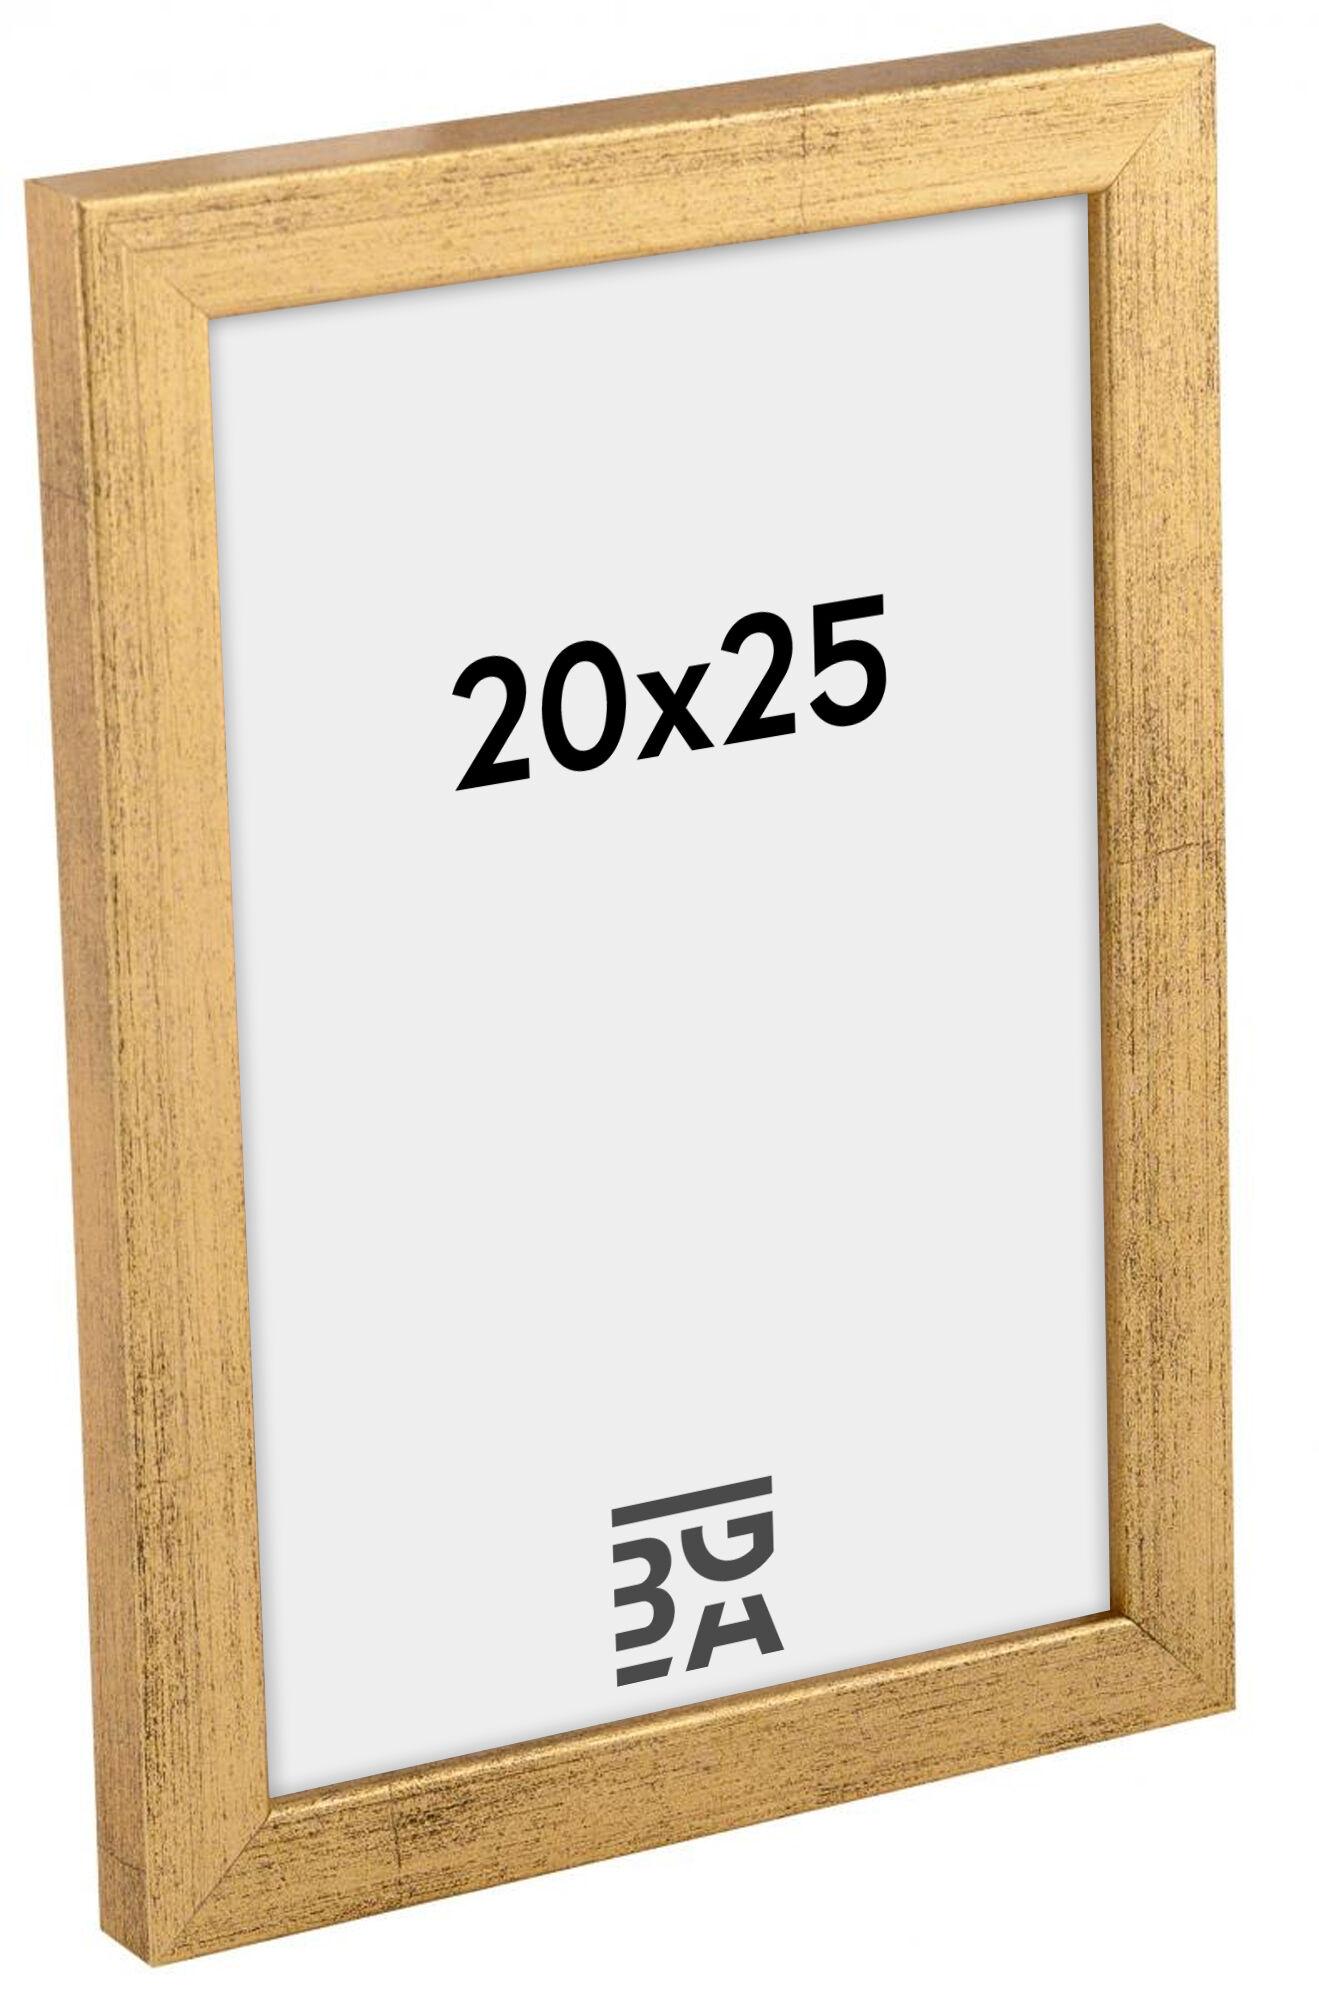 Estancia Galant Kullanvärinen 20x25 cm